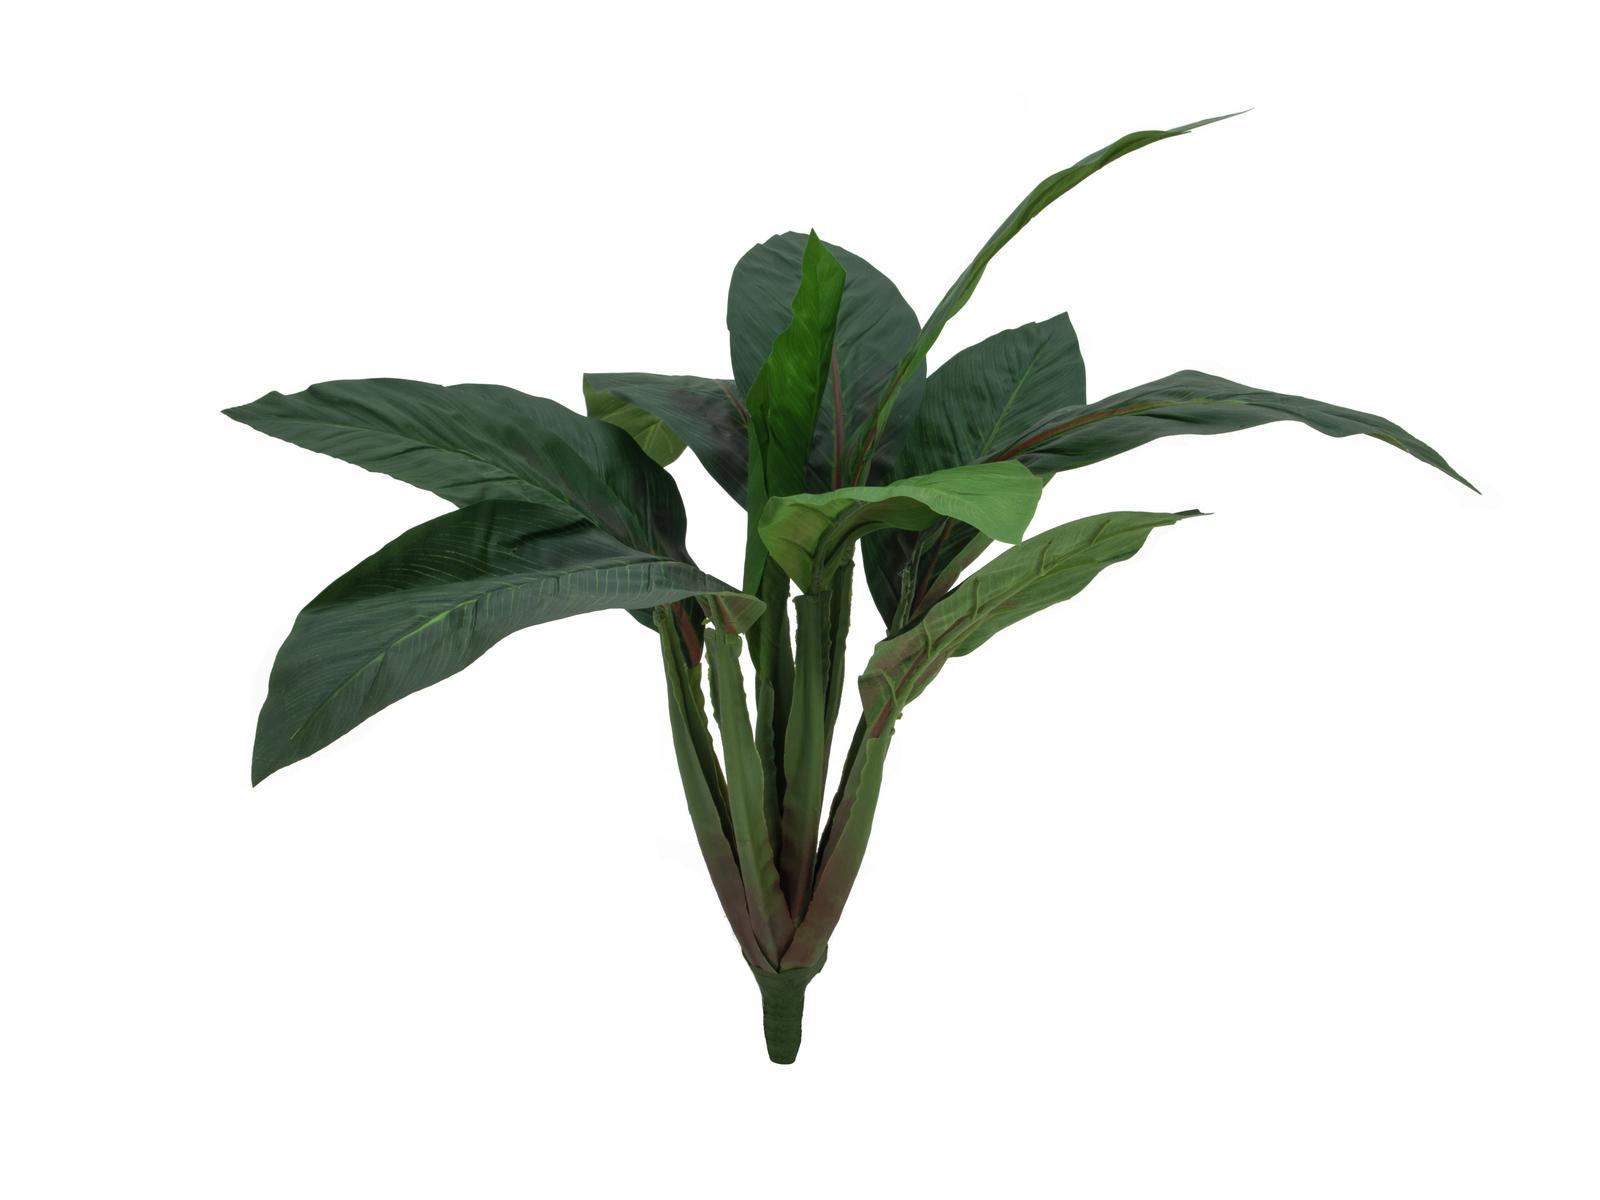 EUROPALMS pianta artificiale Sago palma, 45cm